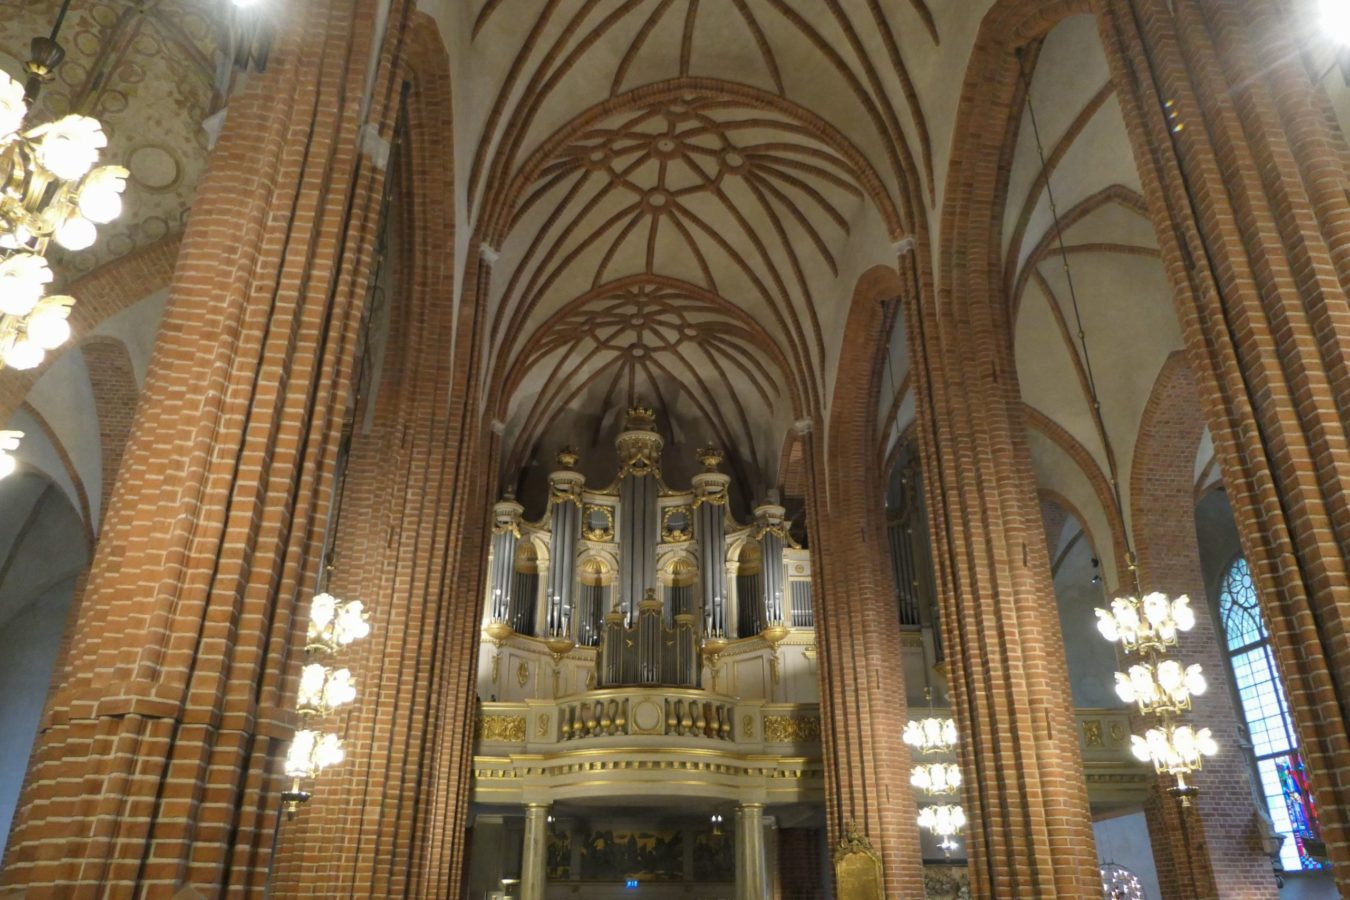 Stockholm Schweden Gamla Stan Stadsholmen Altstadt Storykyrkan Kirche Orgel